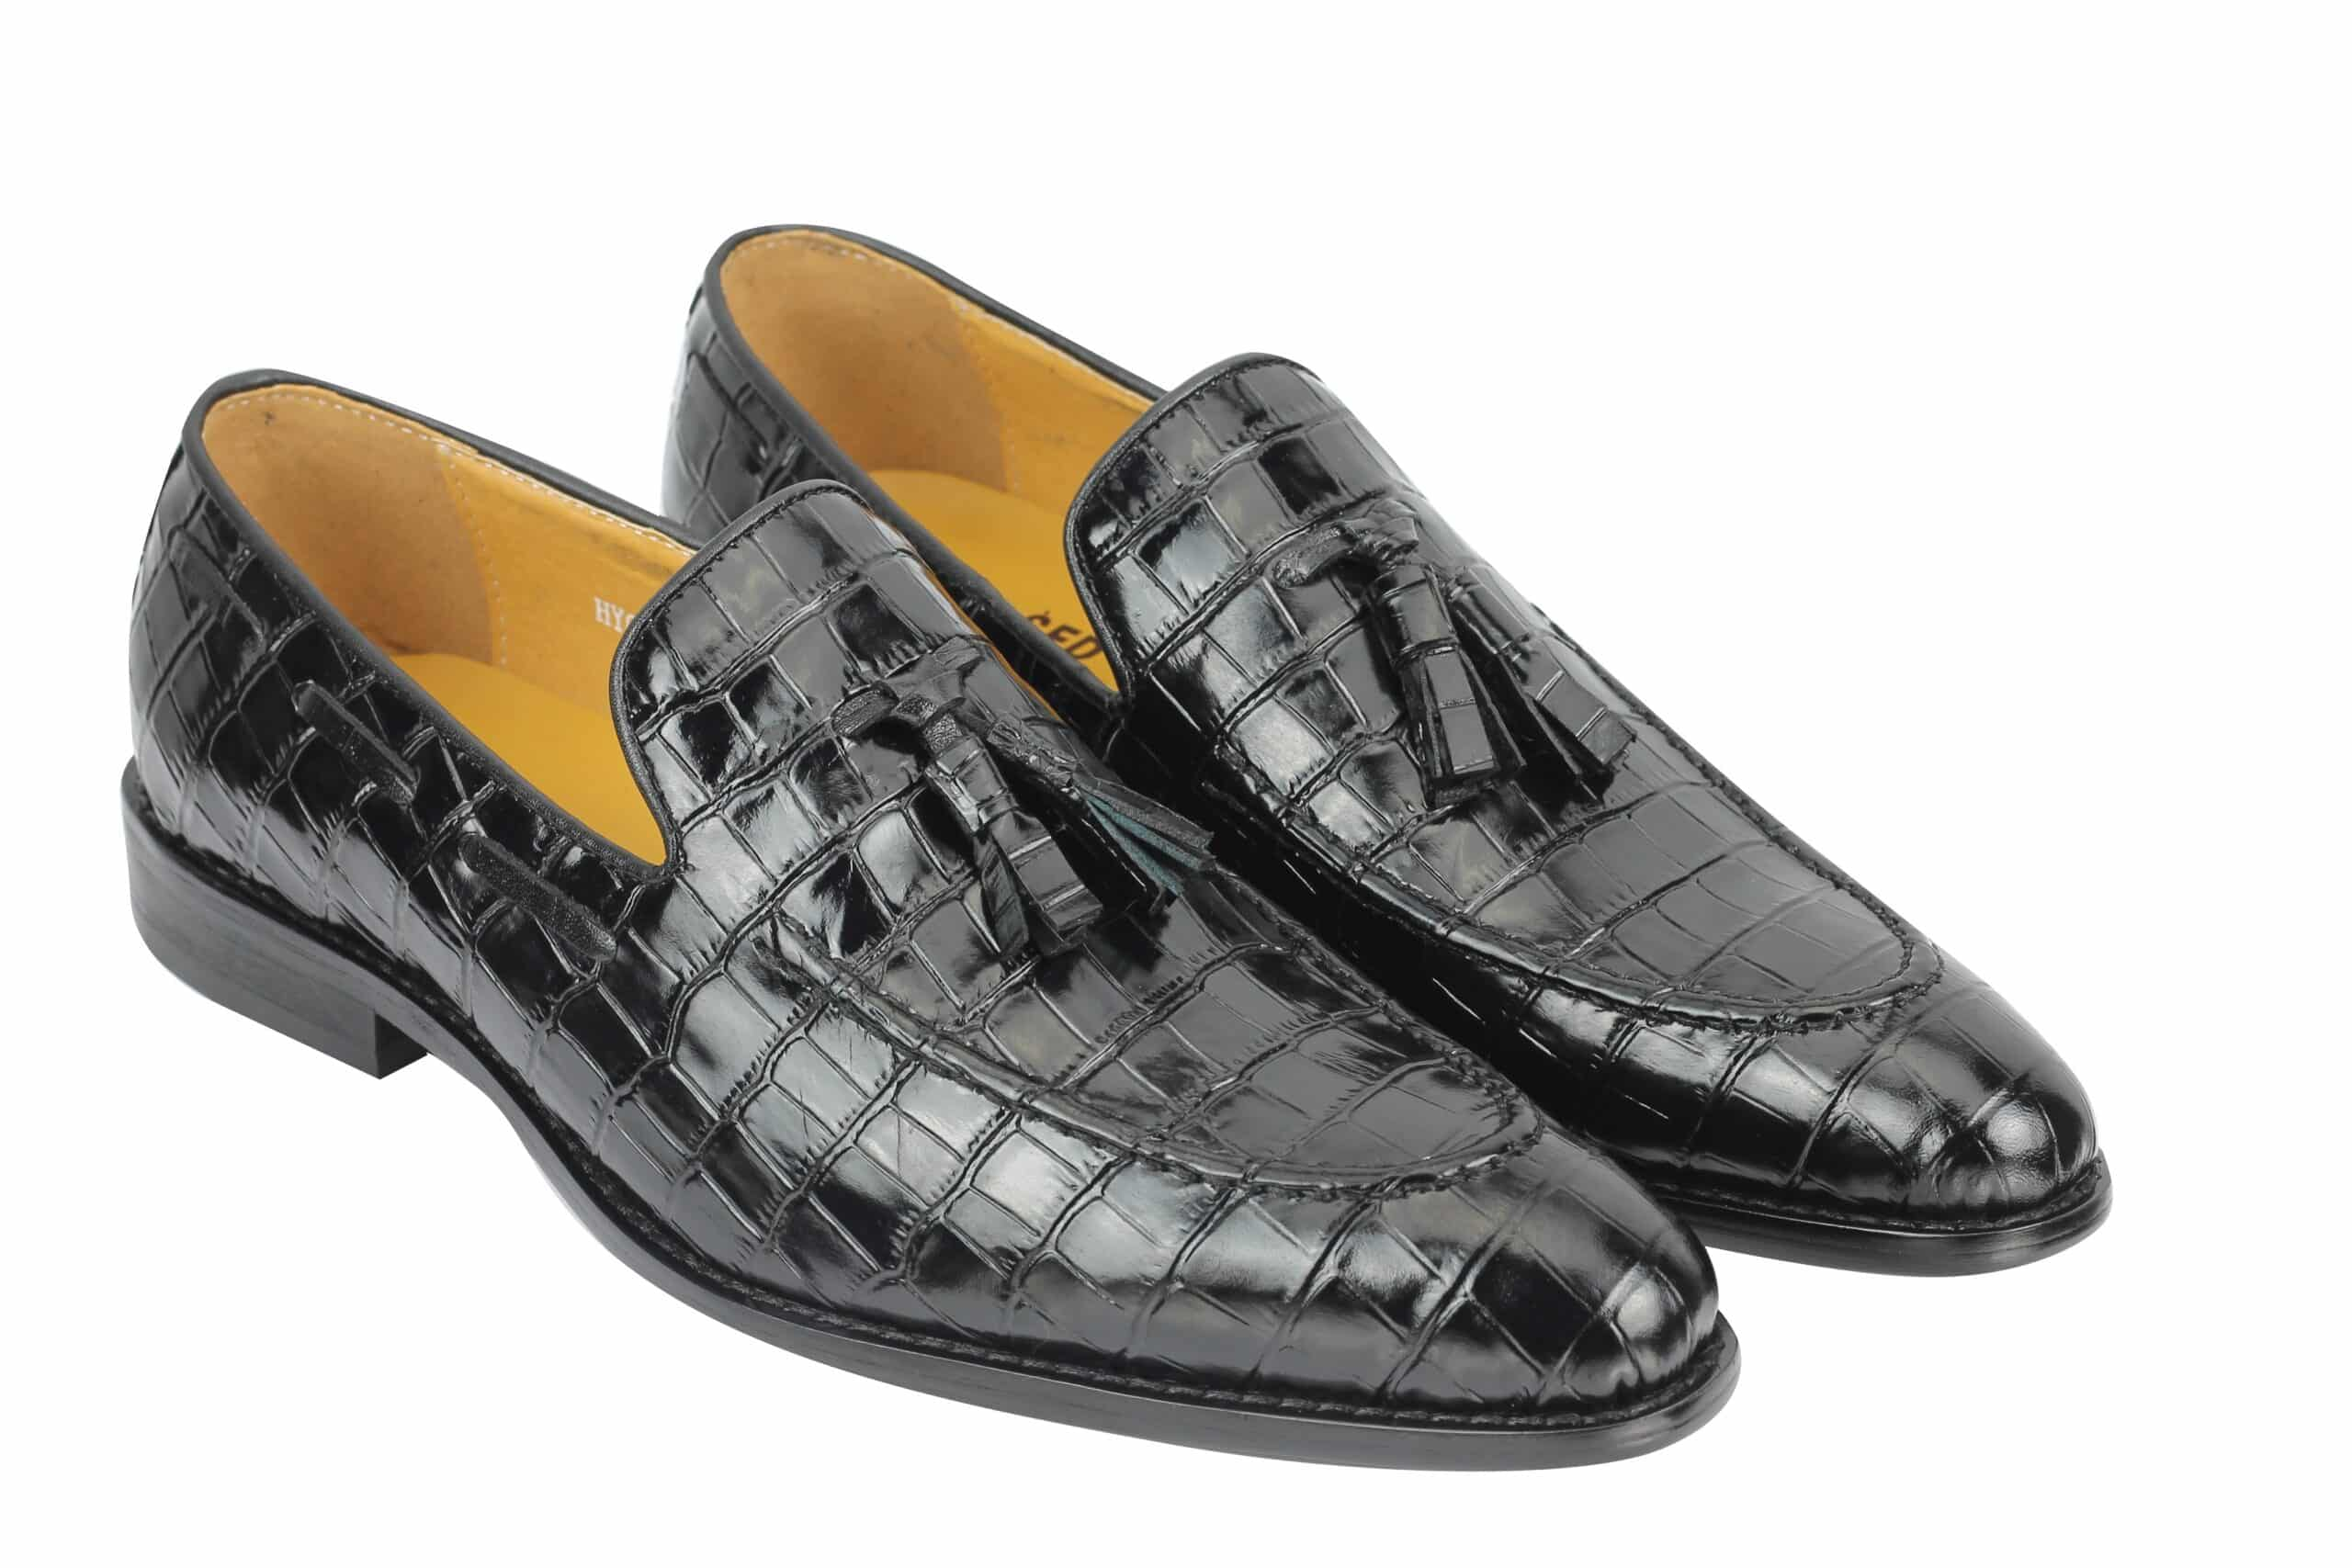 Sepatu-Fantofel-Crocodile-Loafers-Shoes